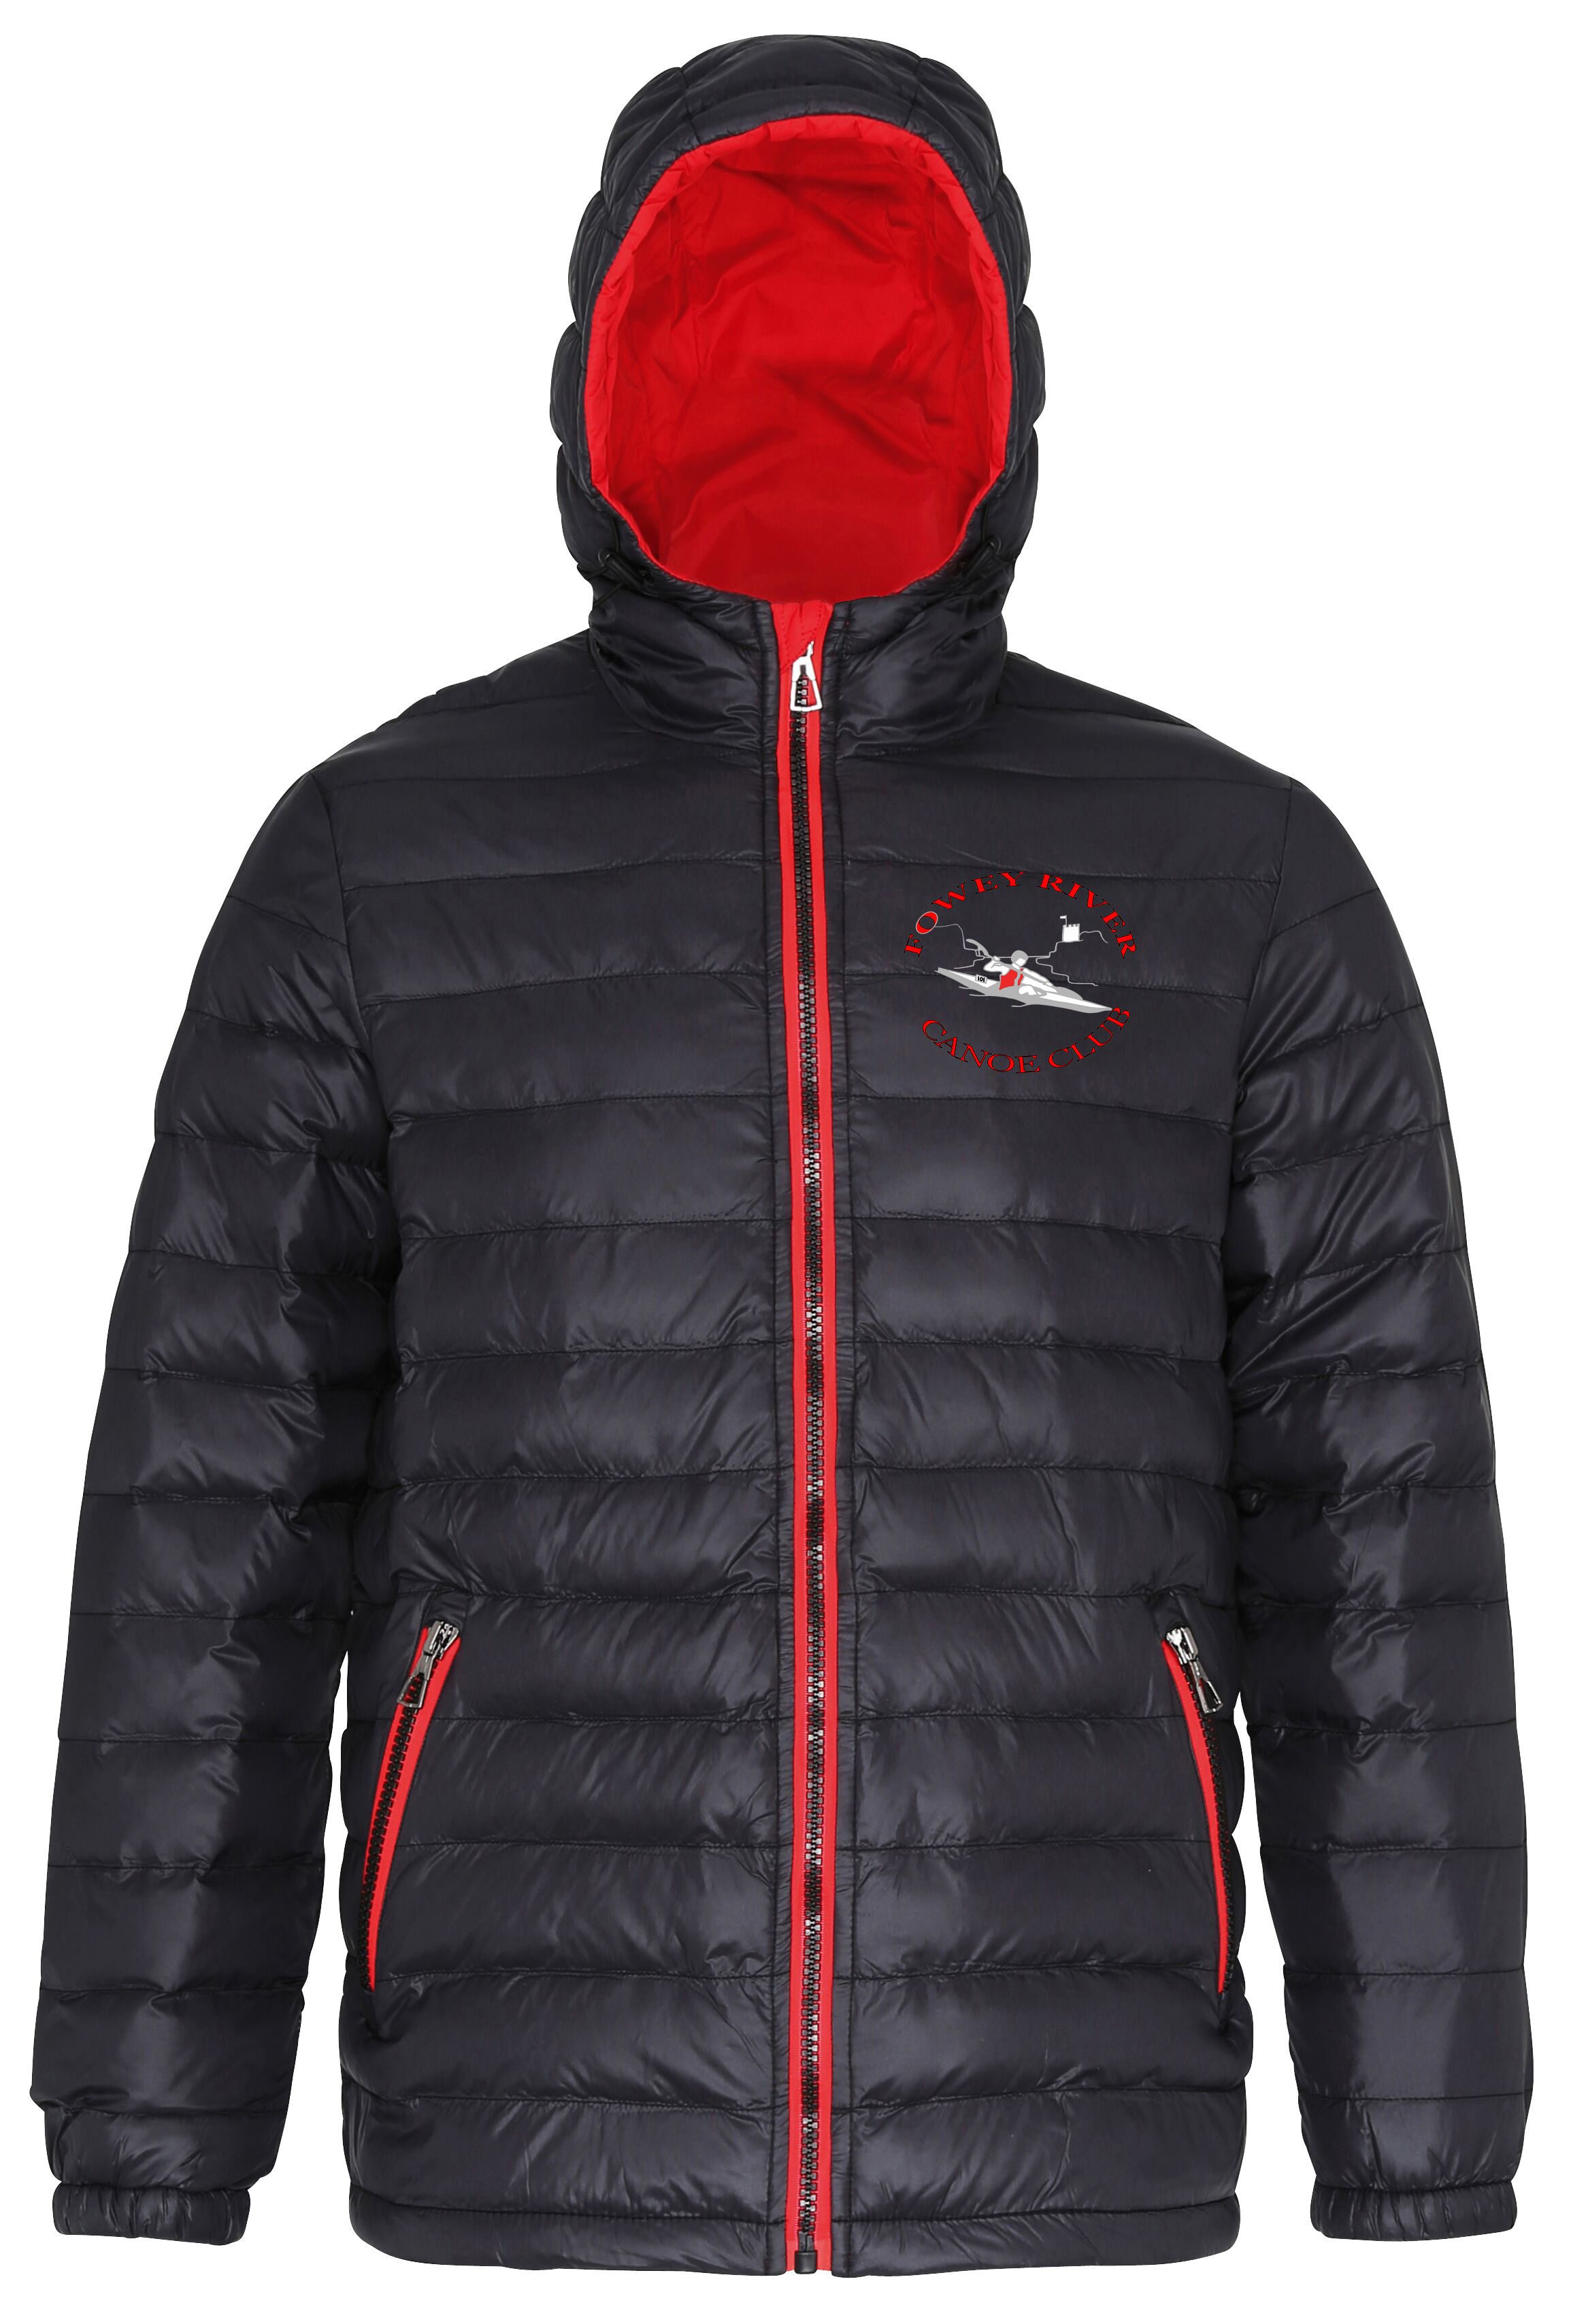 2786 Snowbird